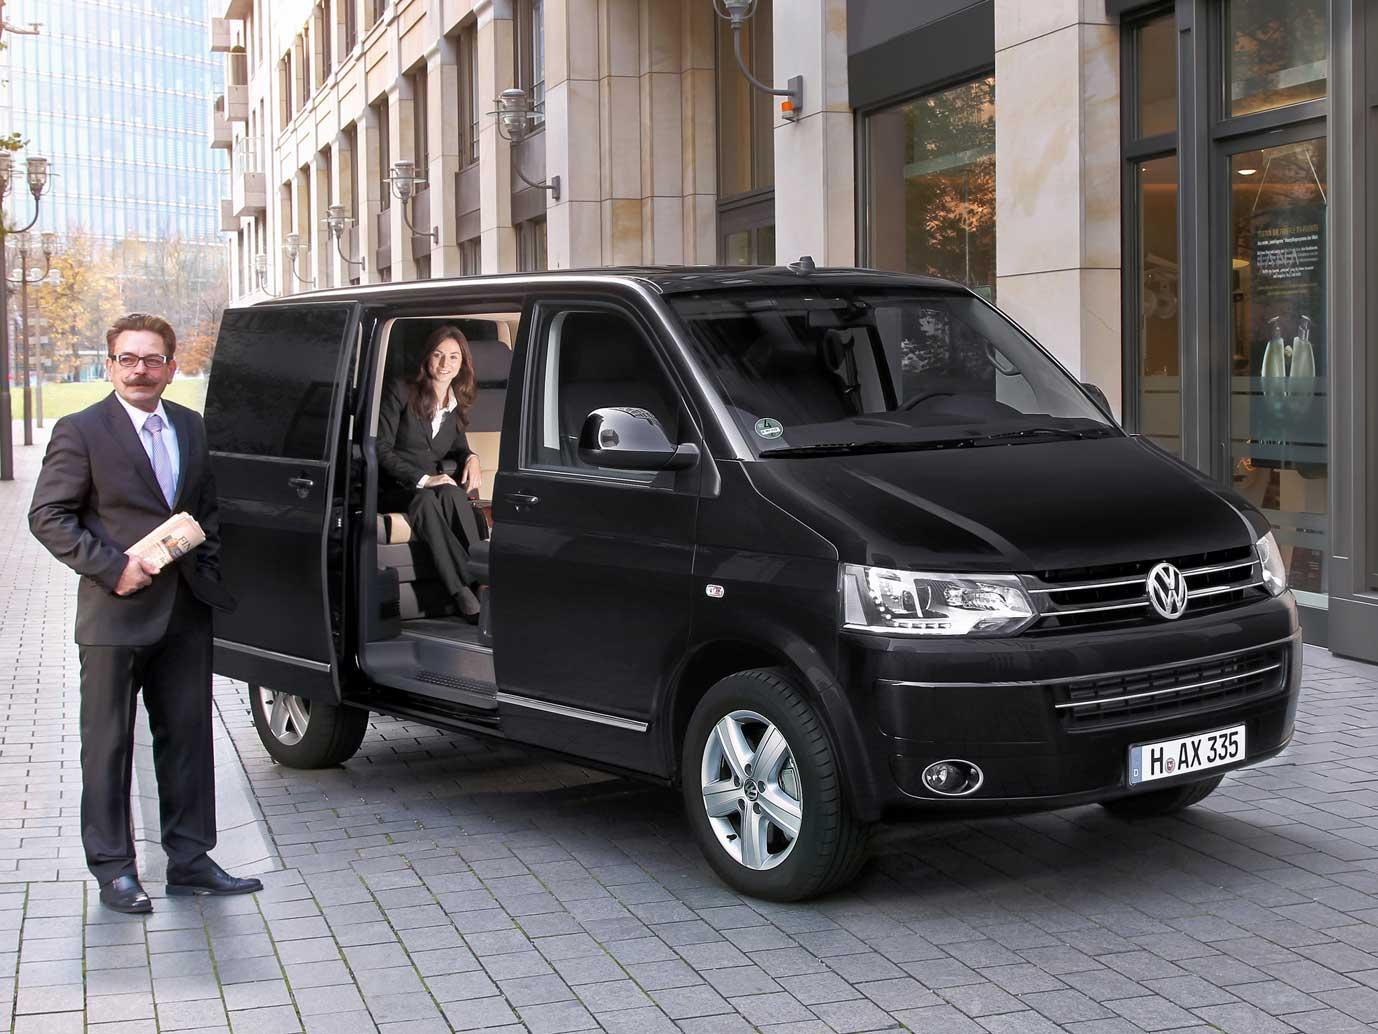 Nueva Volkswagen Multivan T5 2013 Argentina Equipamiento